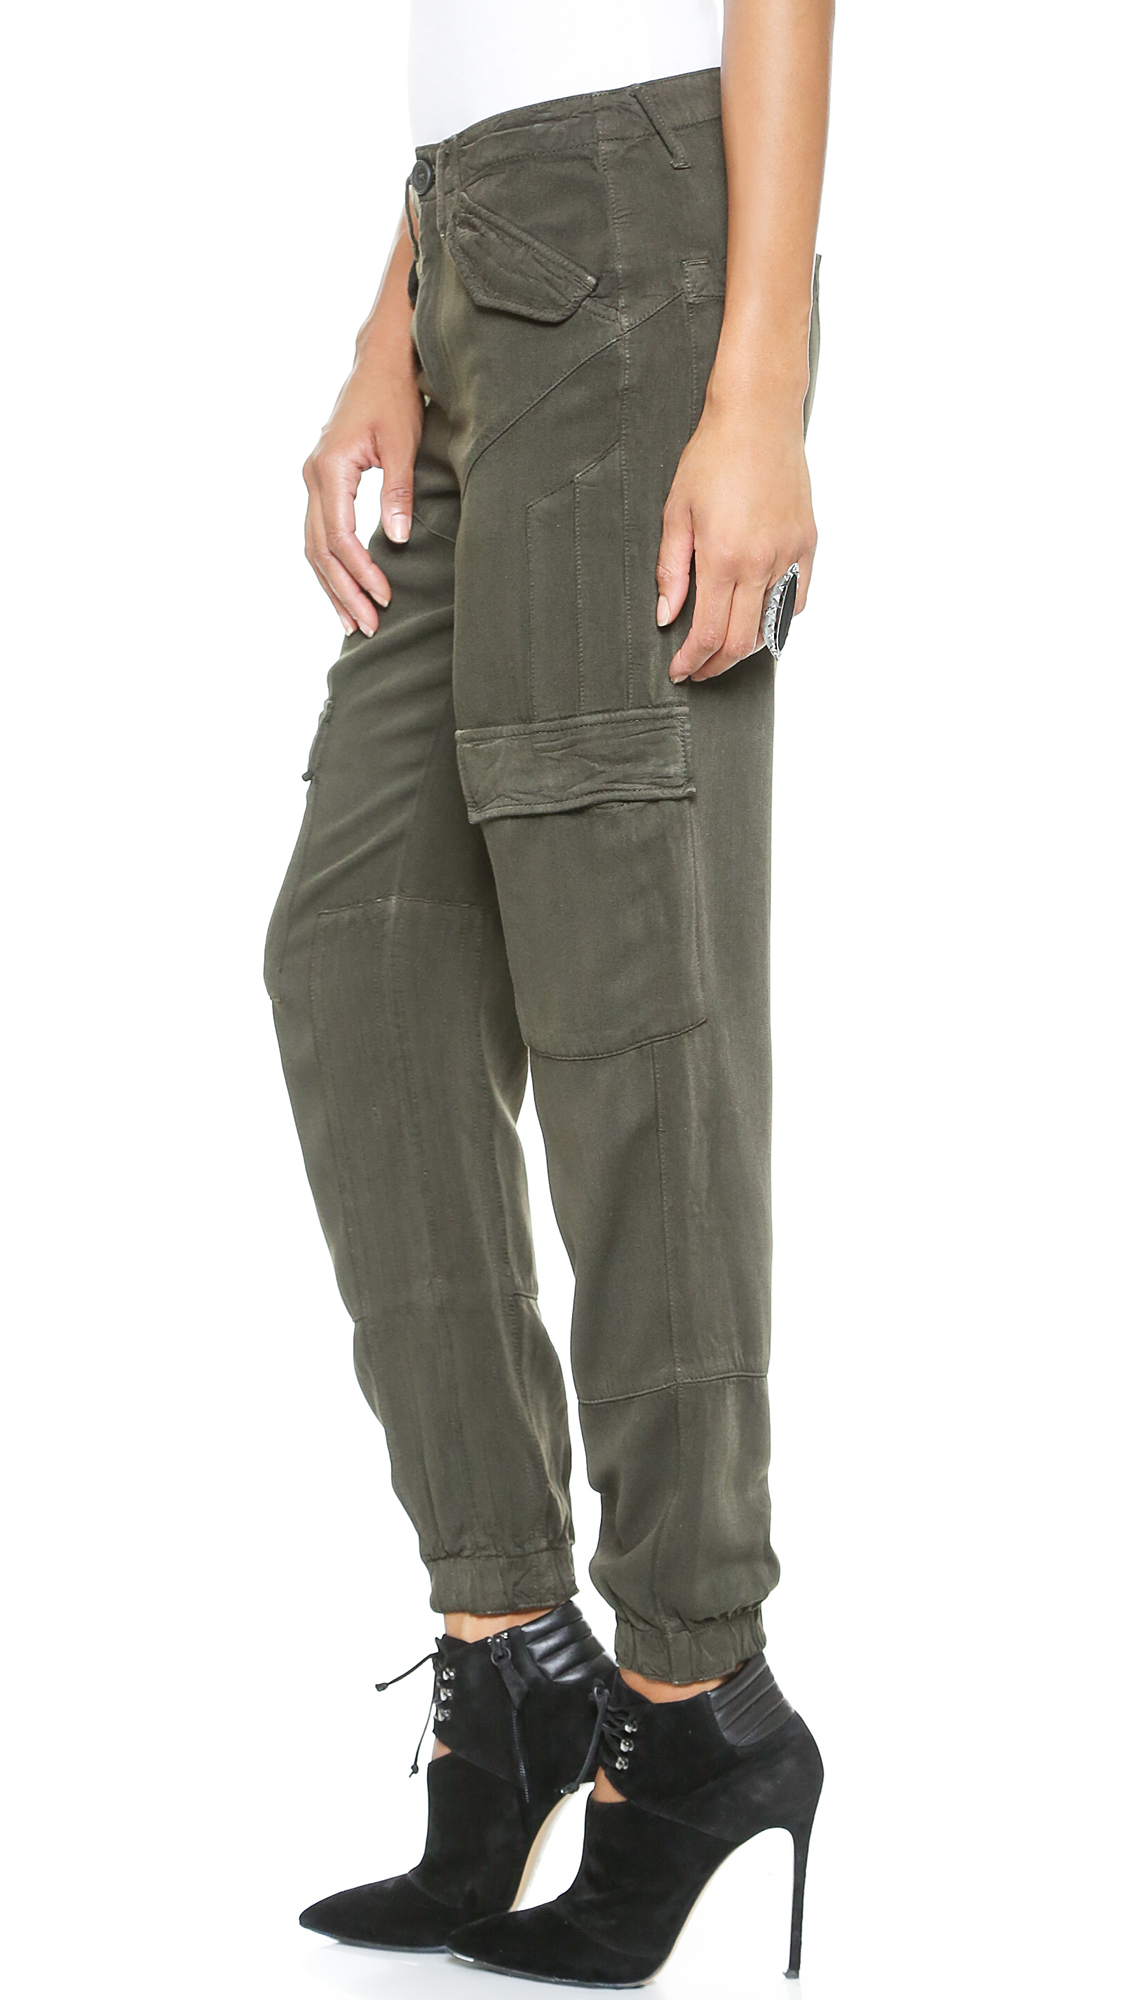 Dwp Kat Slouchy Cargo Pants - Hunter Green in Green | Lyst